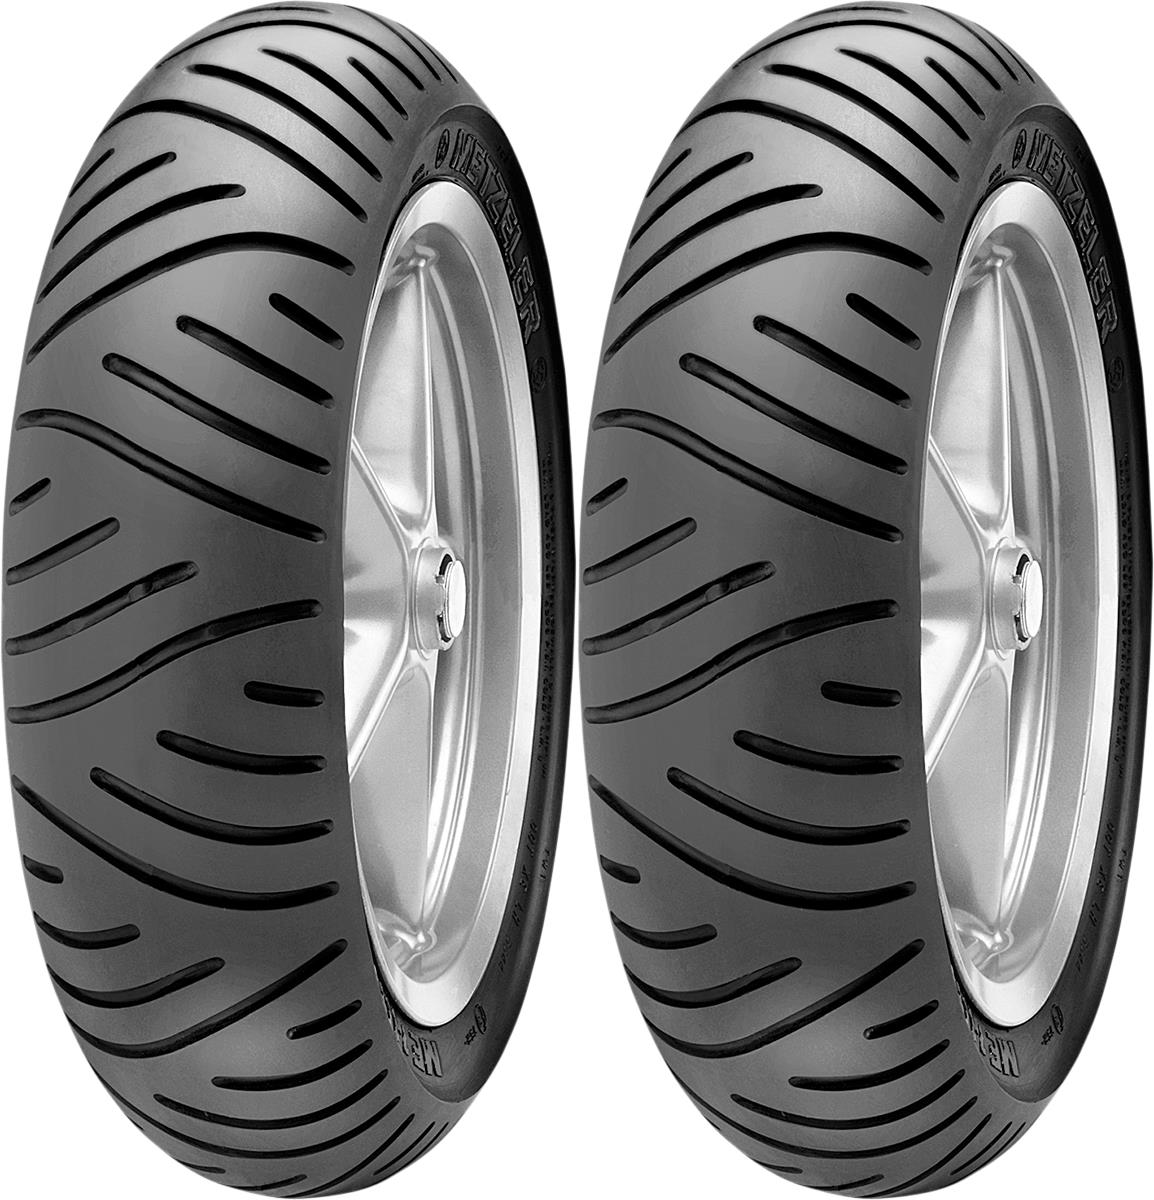 METZELER ME 7 Teen Front & Rear Tire Set, 130/70-10 59L Reinforced